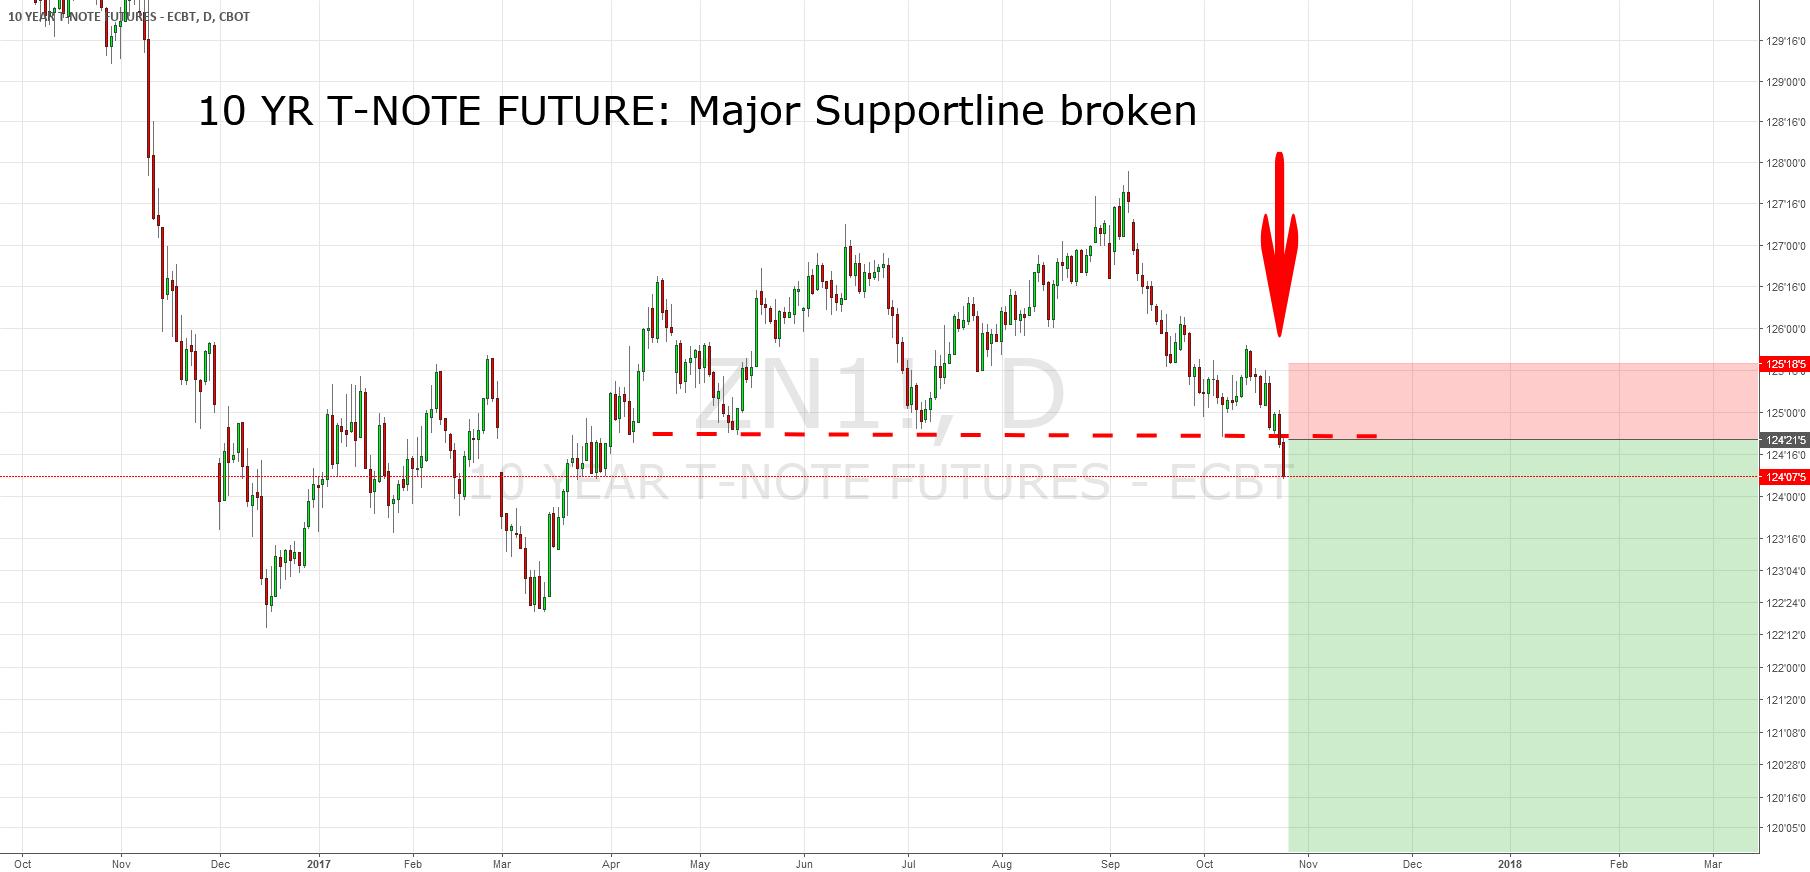 10 YR T-Note Futures: Major Support Line Broken